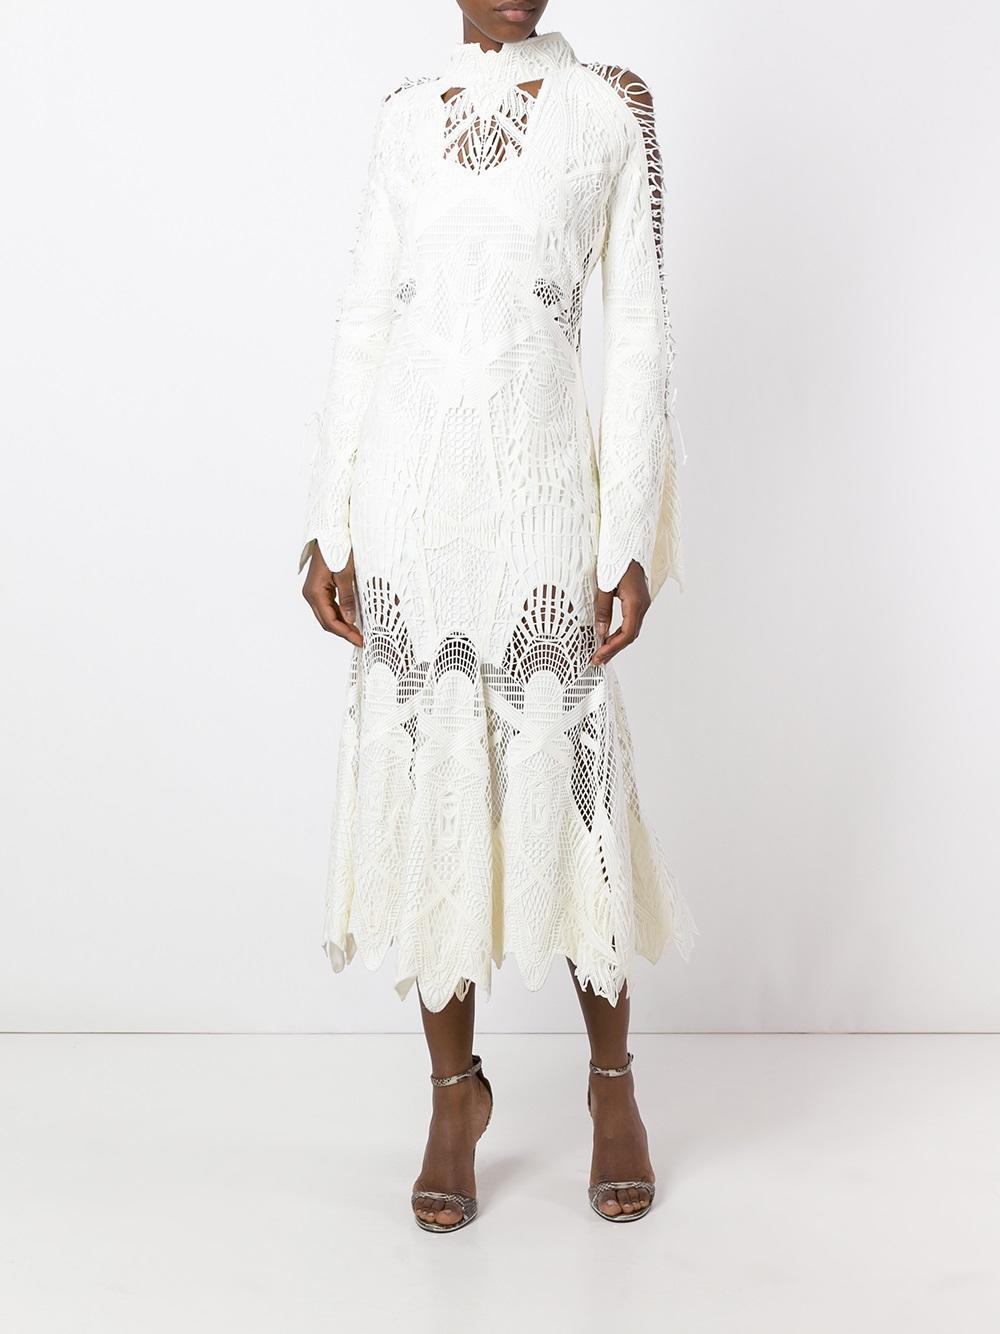 Lyst Jonathan Simkhai Laced Trumpet Dress In White